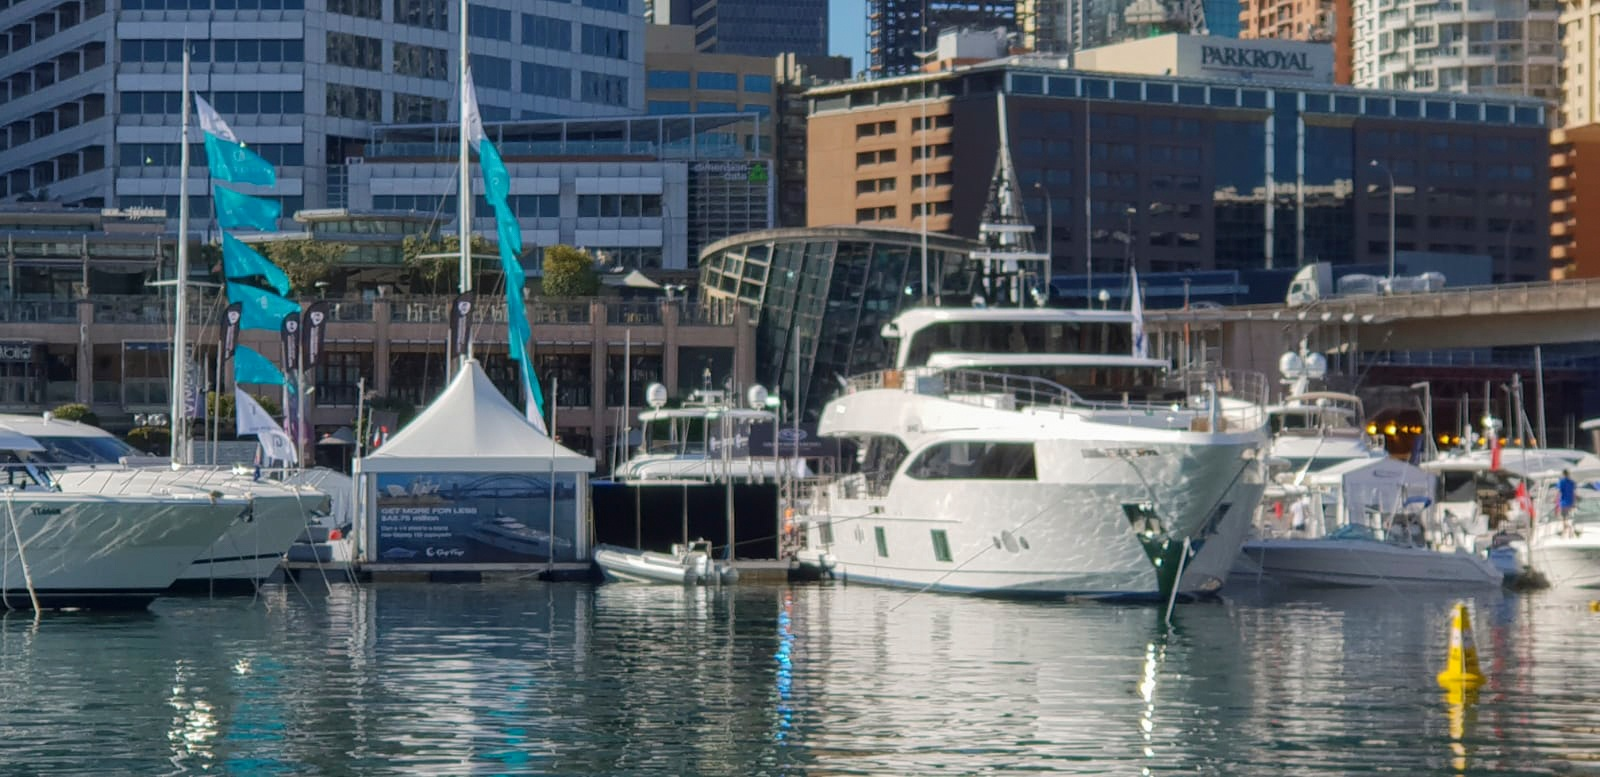 Gulf Craft at Sydney International Boat Show 2018 (1).jpg